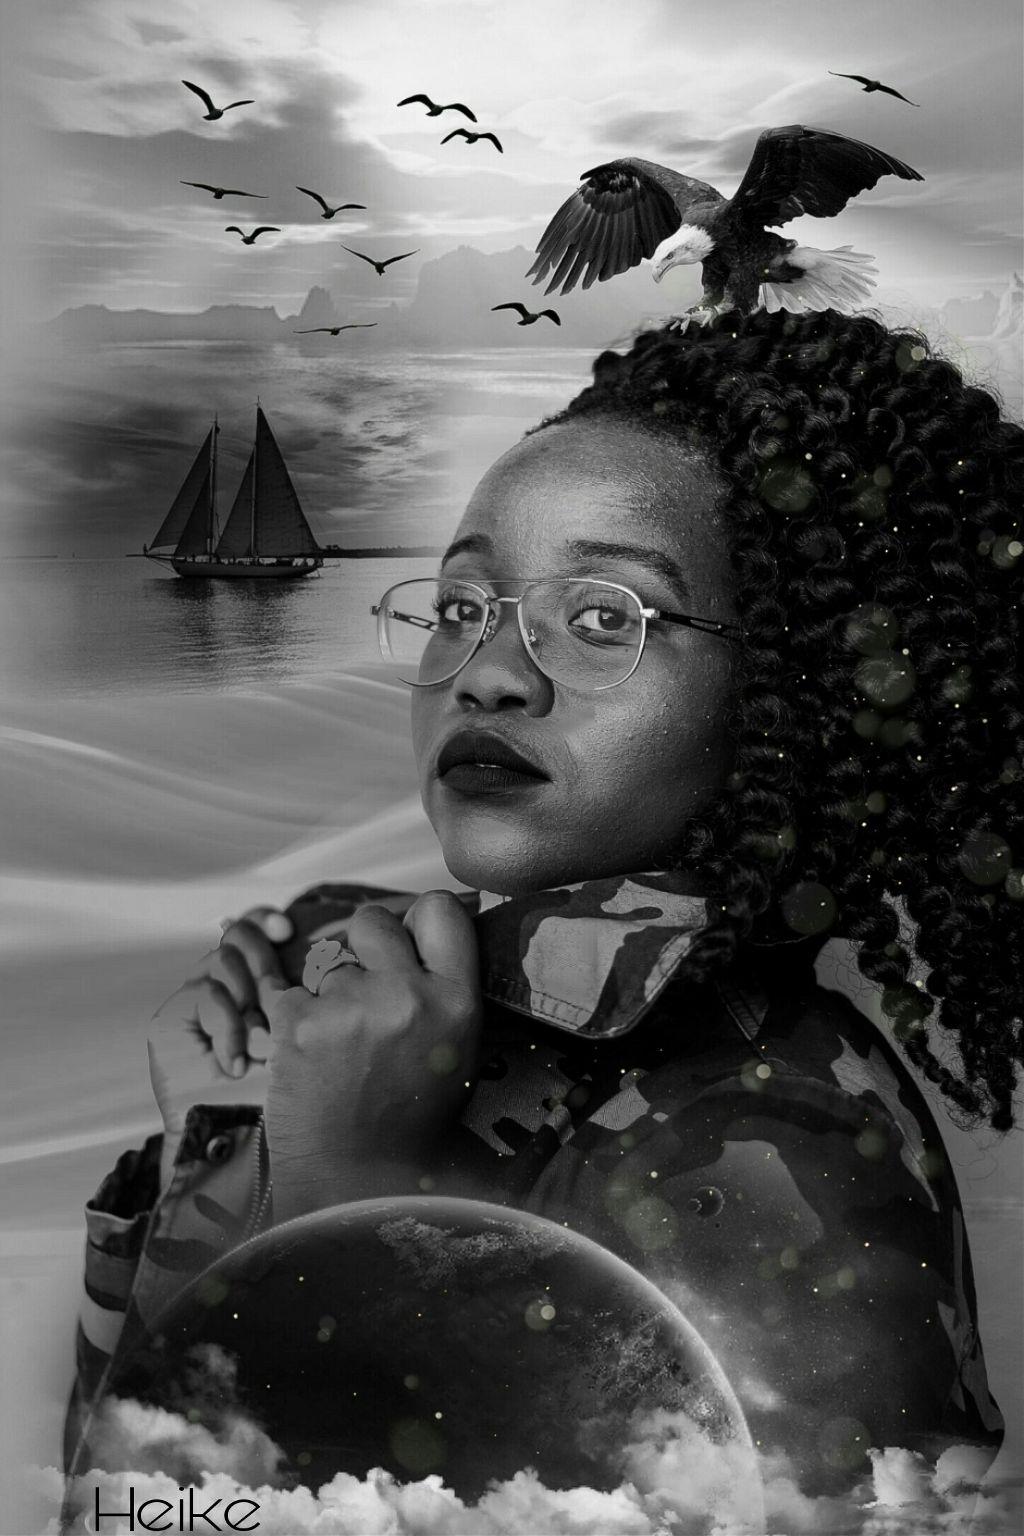 #freetoedit #onesparklebrush #blackandwhite #fantasyart #surreal#astheticart#myedit#madewithpicsart #remixit #multiexposure